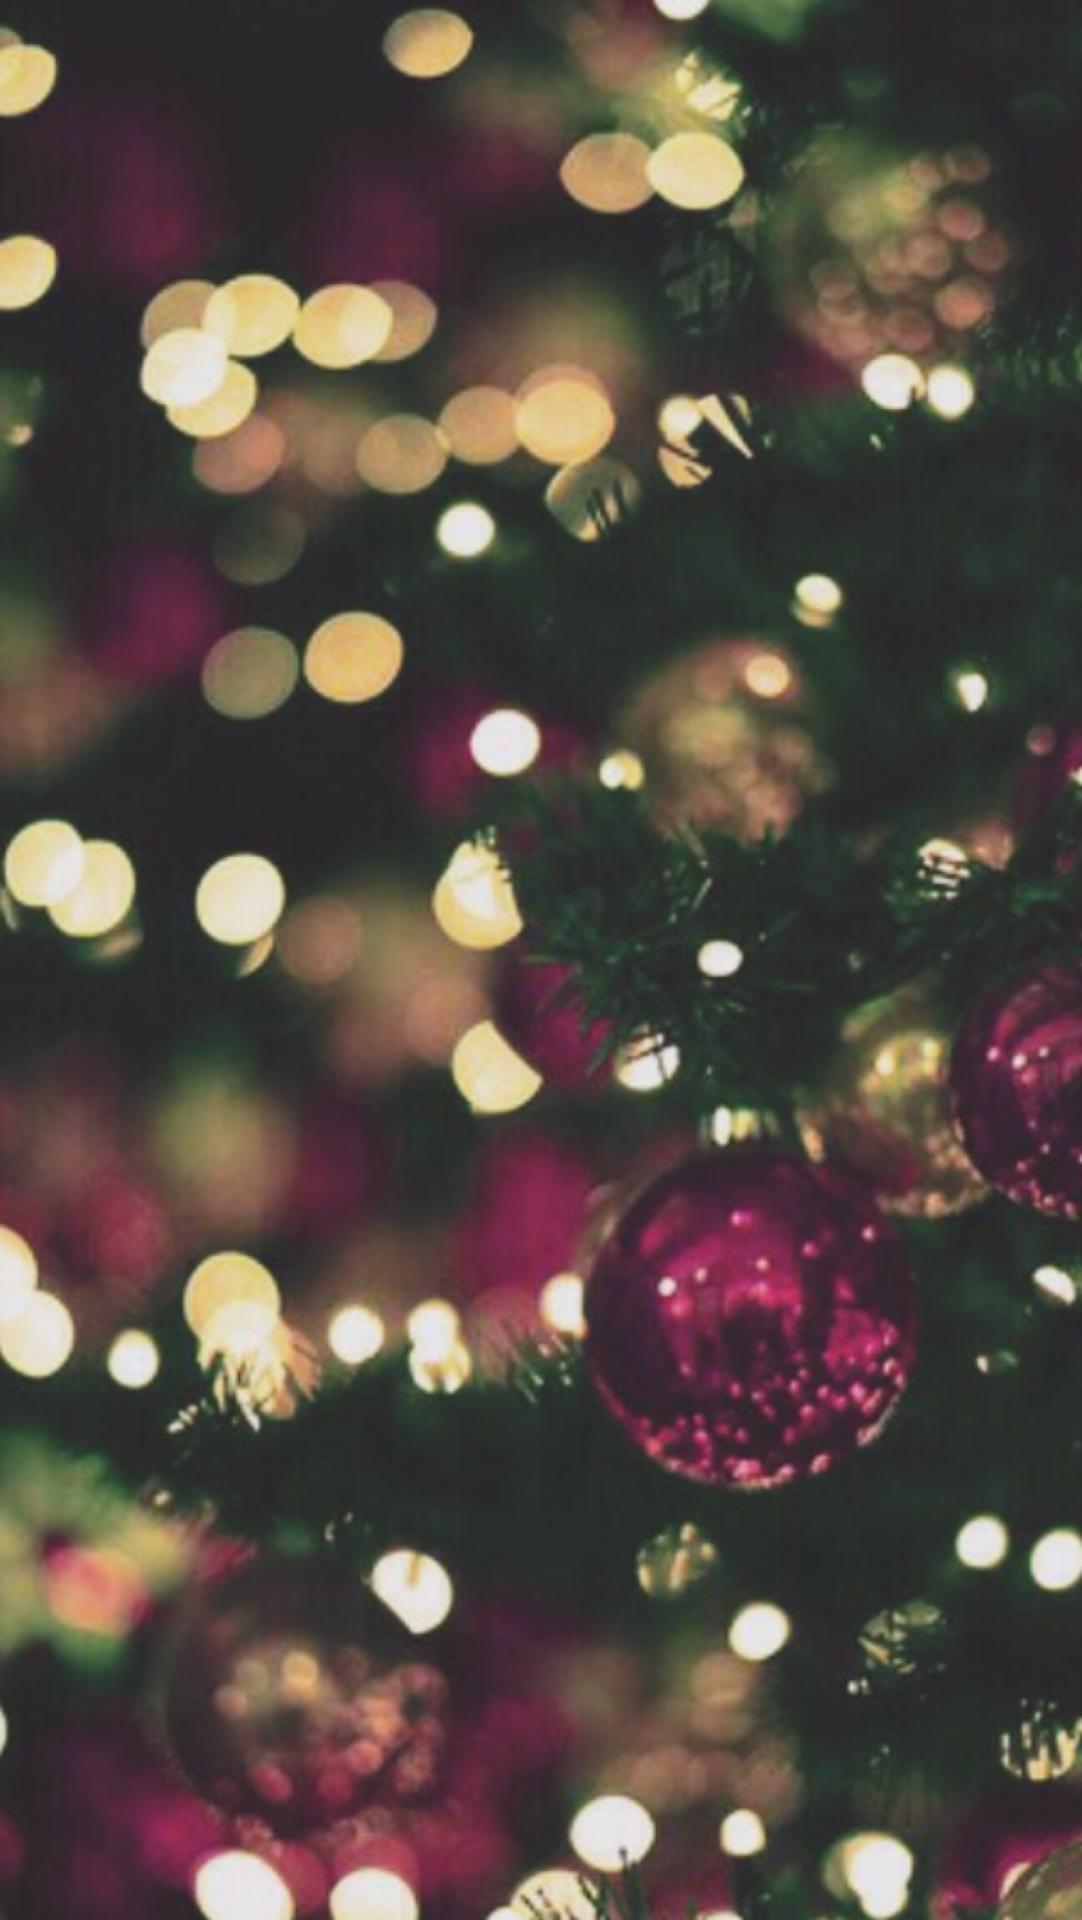 Johnschristmascollection Tumblr Com Christmas Lockscreen Backgrounds Iphone Christmas